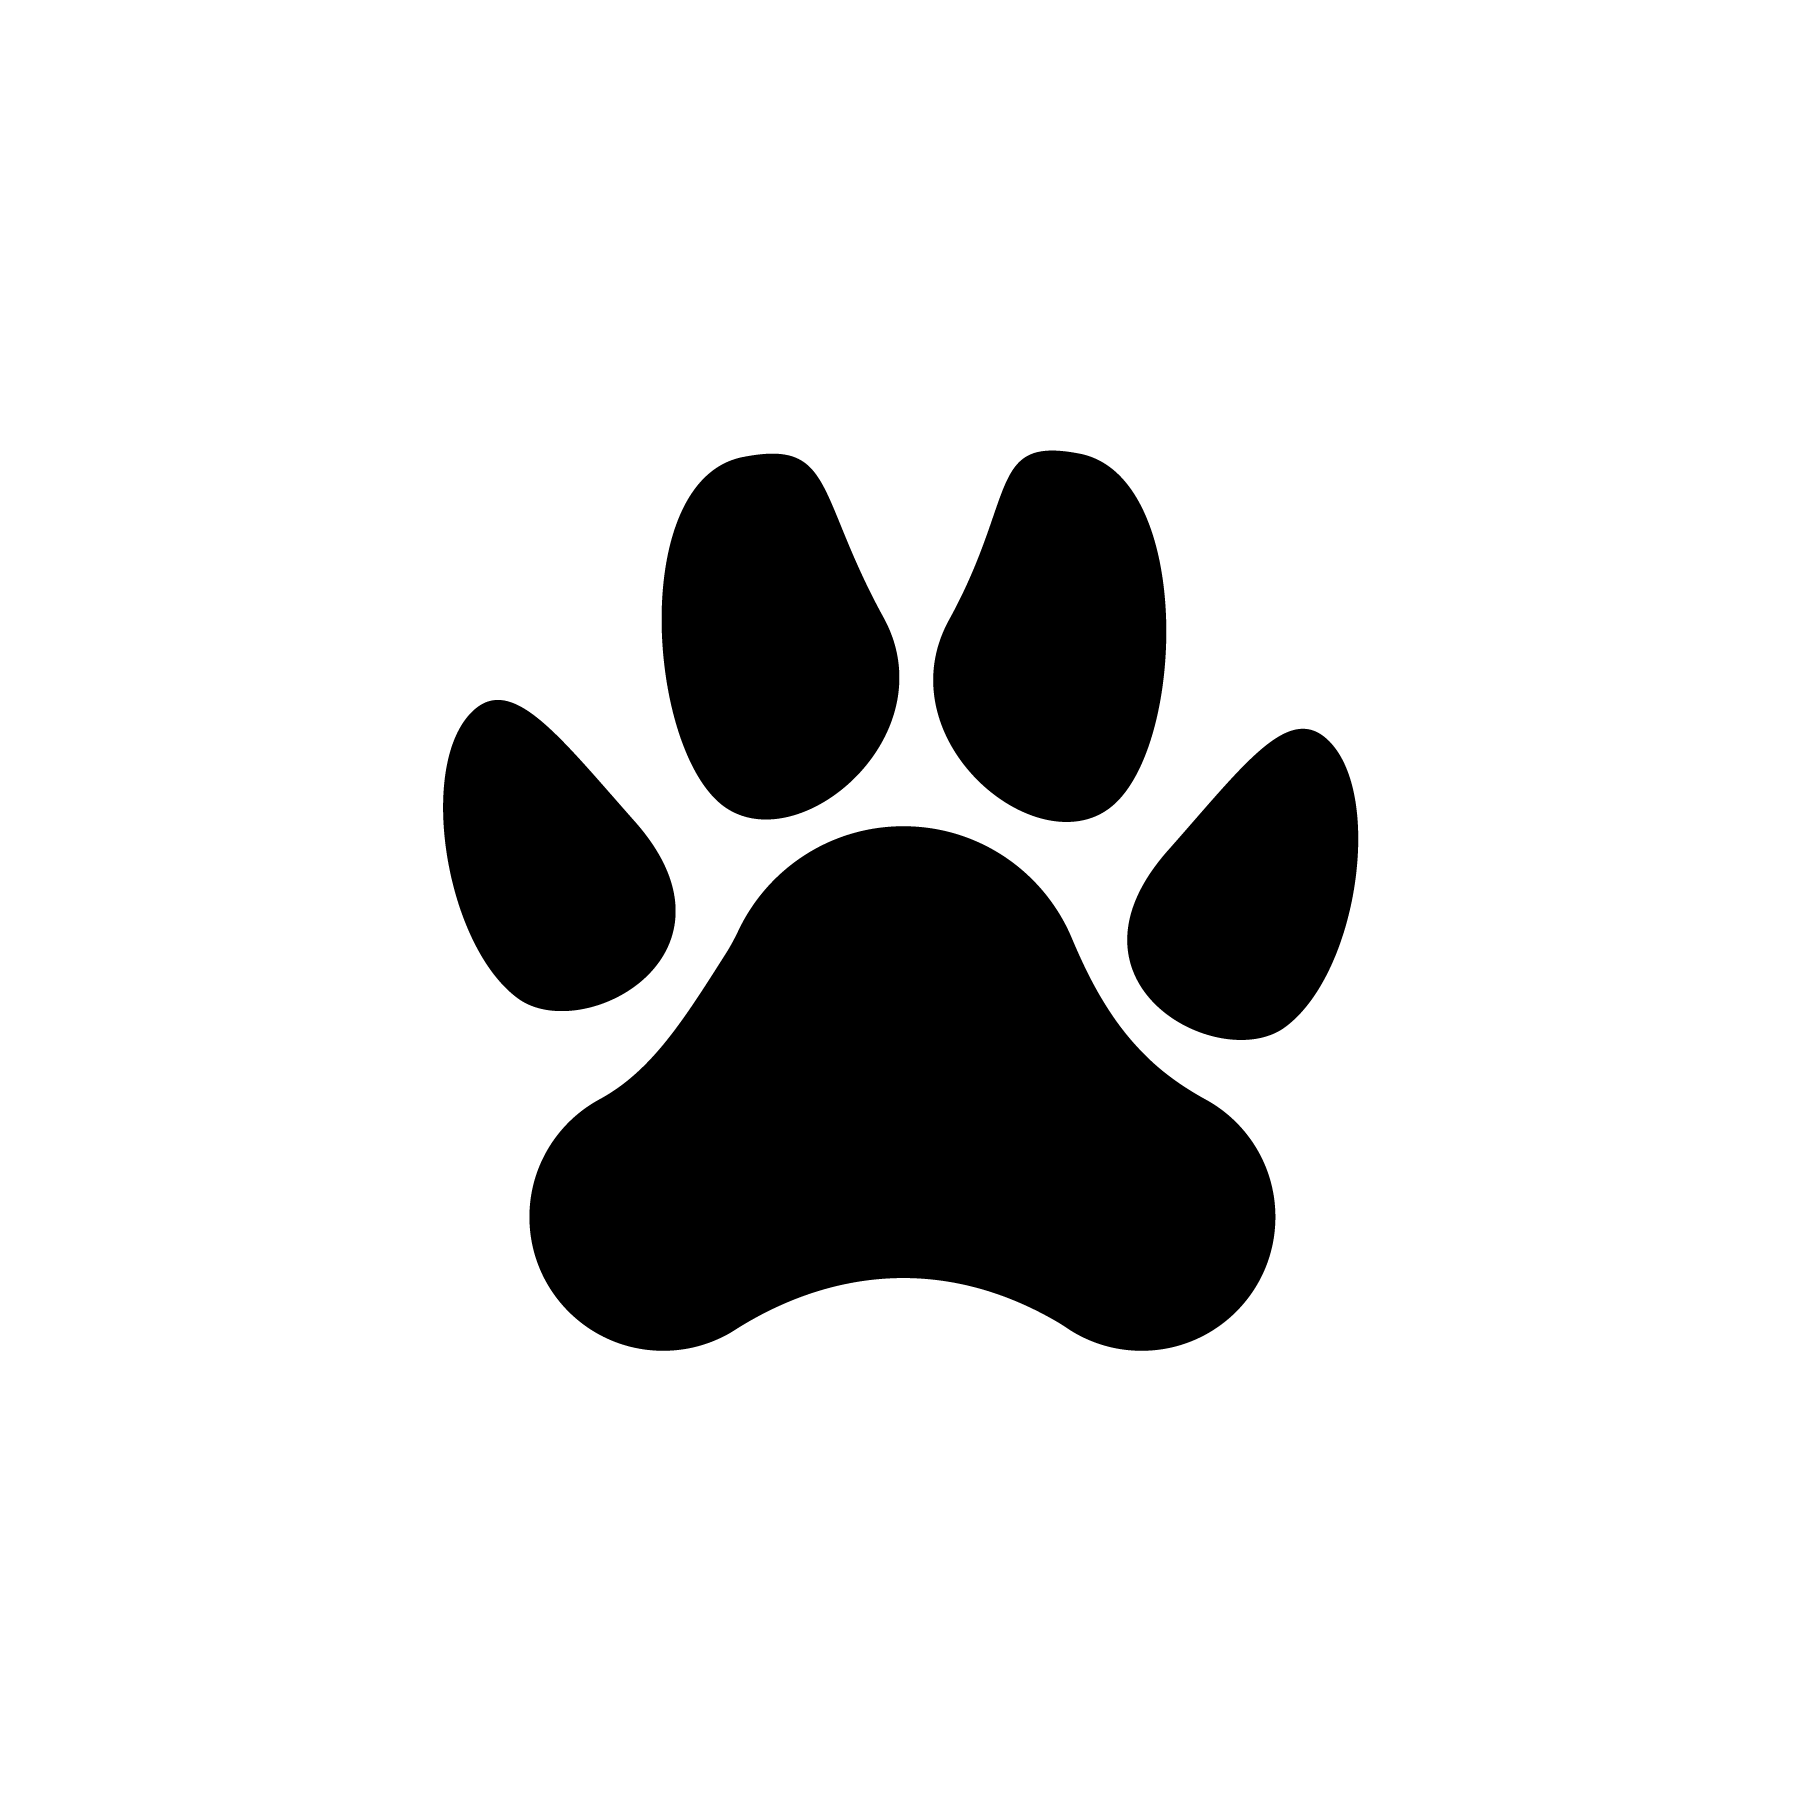 Dog Paw Print Icons Jessicabarrondesigns Design Graphicdesign Icon Icondesign Adobeillustrator Ai Footprint Pa Dog Paw Print Dog Illustration Art Day